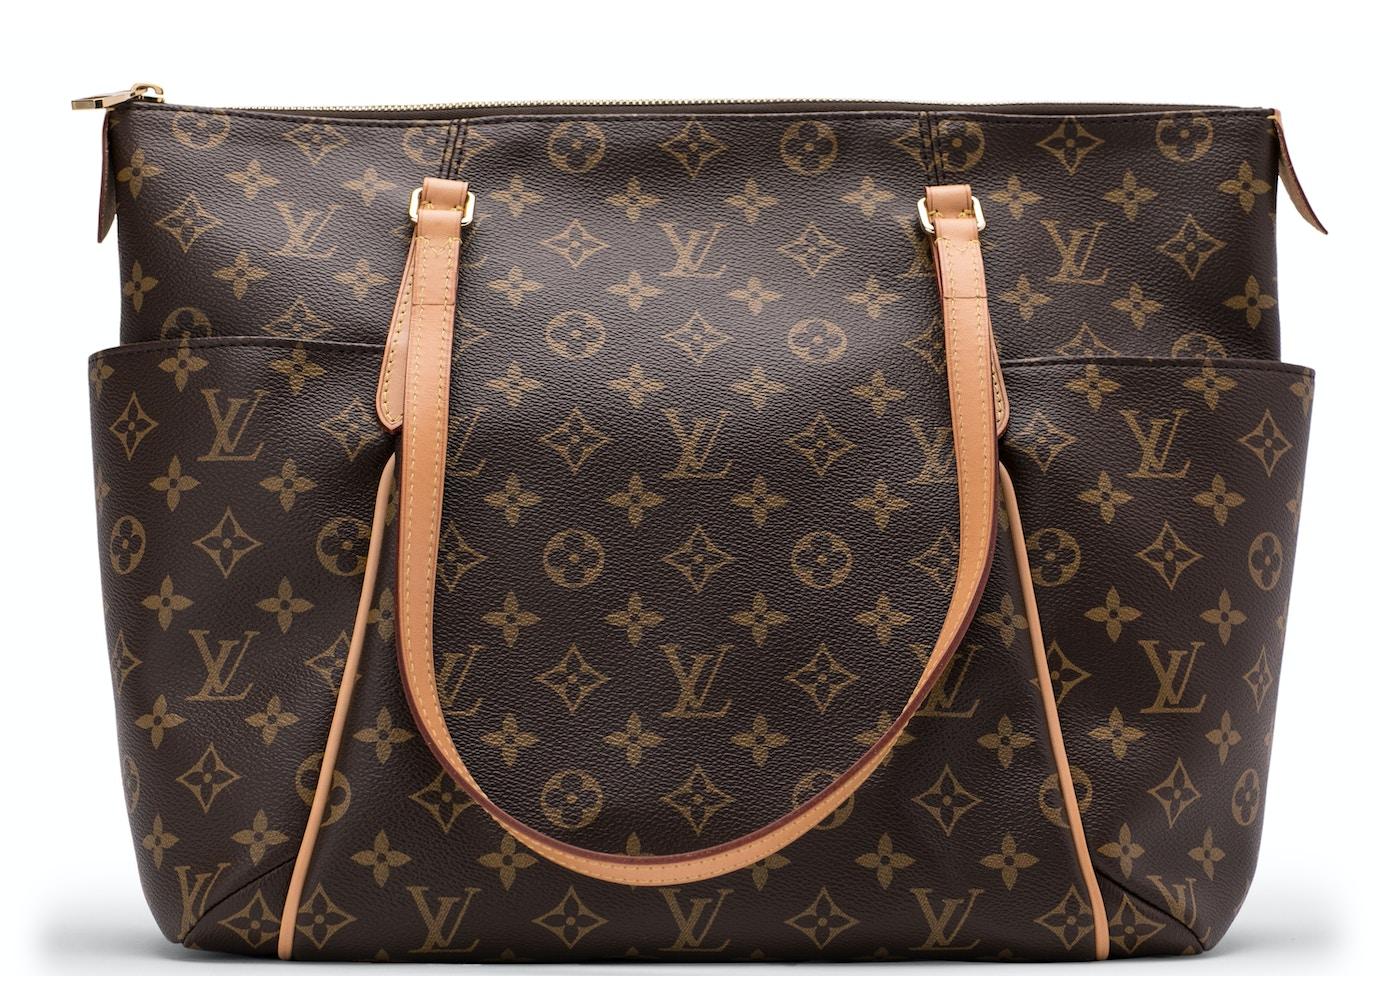 23faef1cdcef Louis Vuitton Totally Monogram MM Brown. Monogram MM Brown